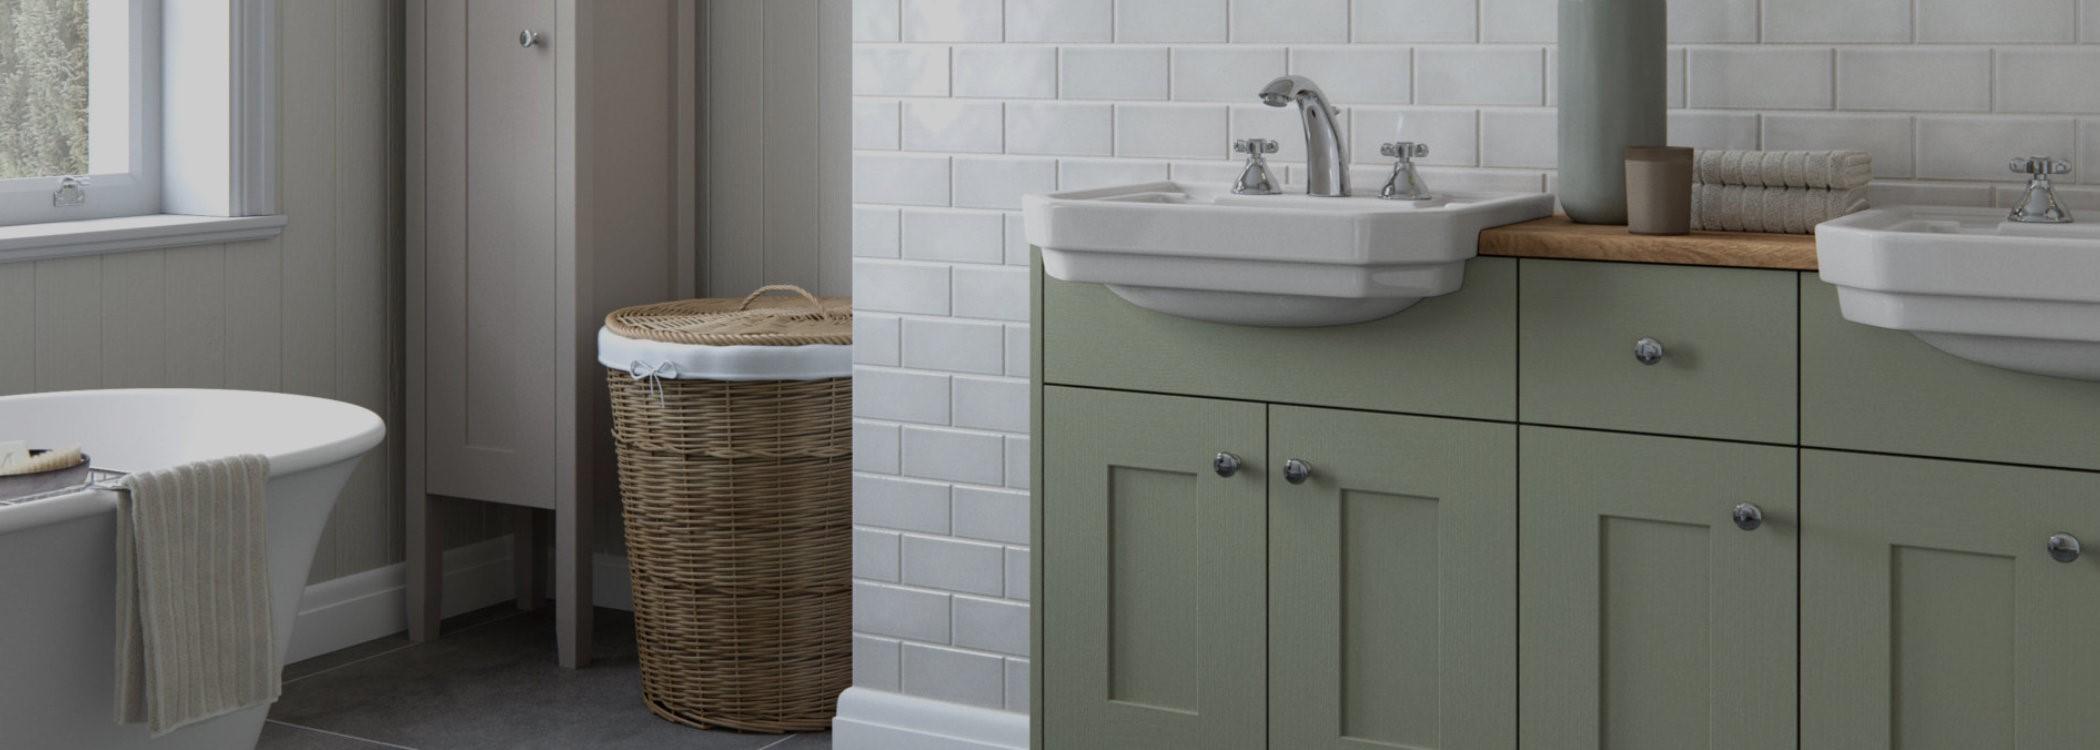 Hepworth Bathroom